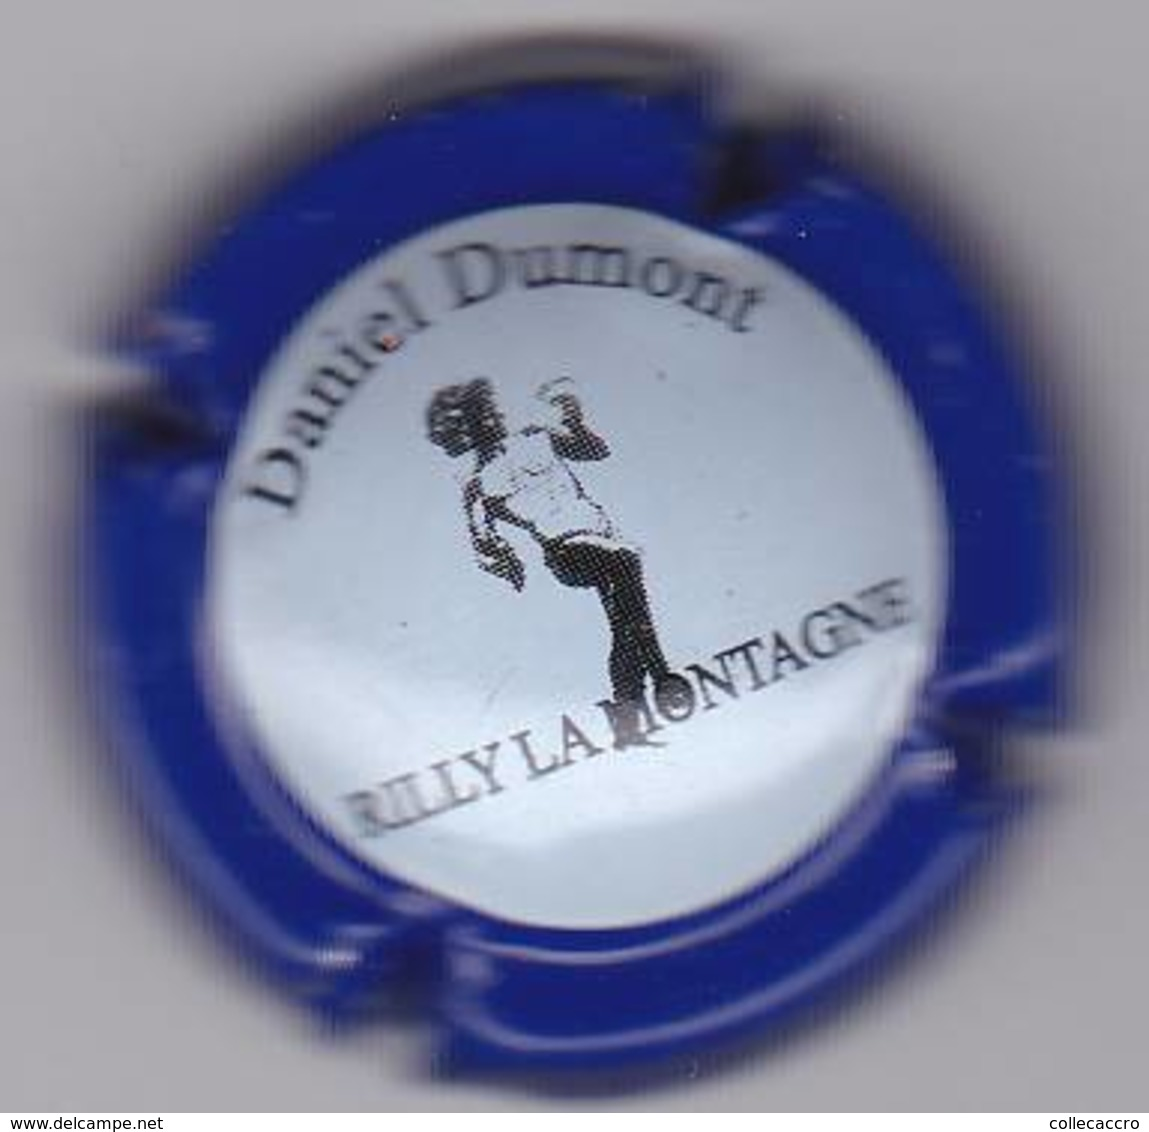 DUMONT DANIEL N°3 - Champagne